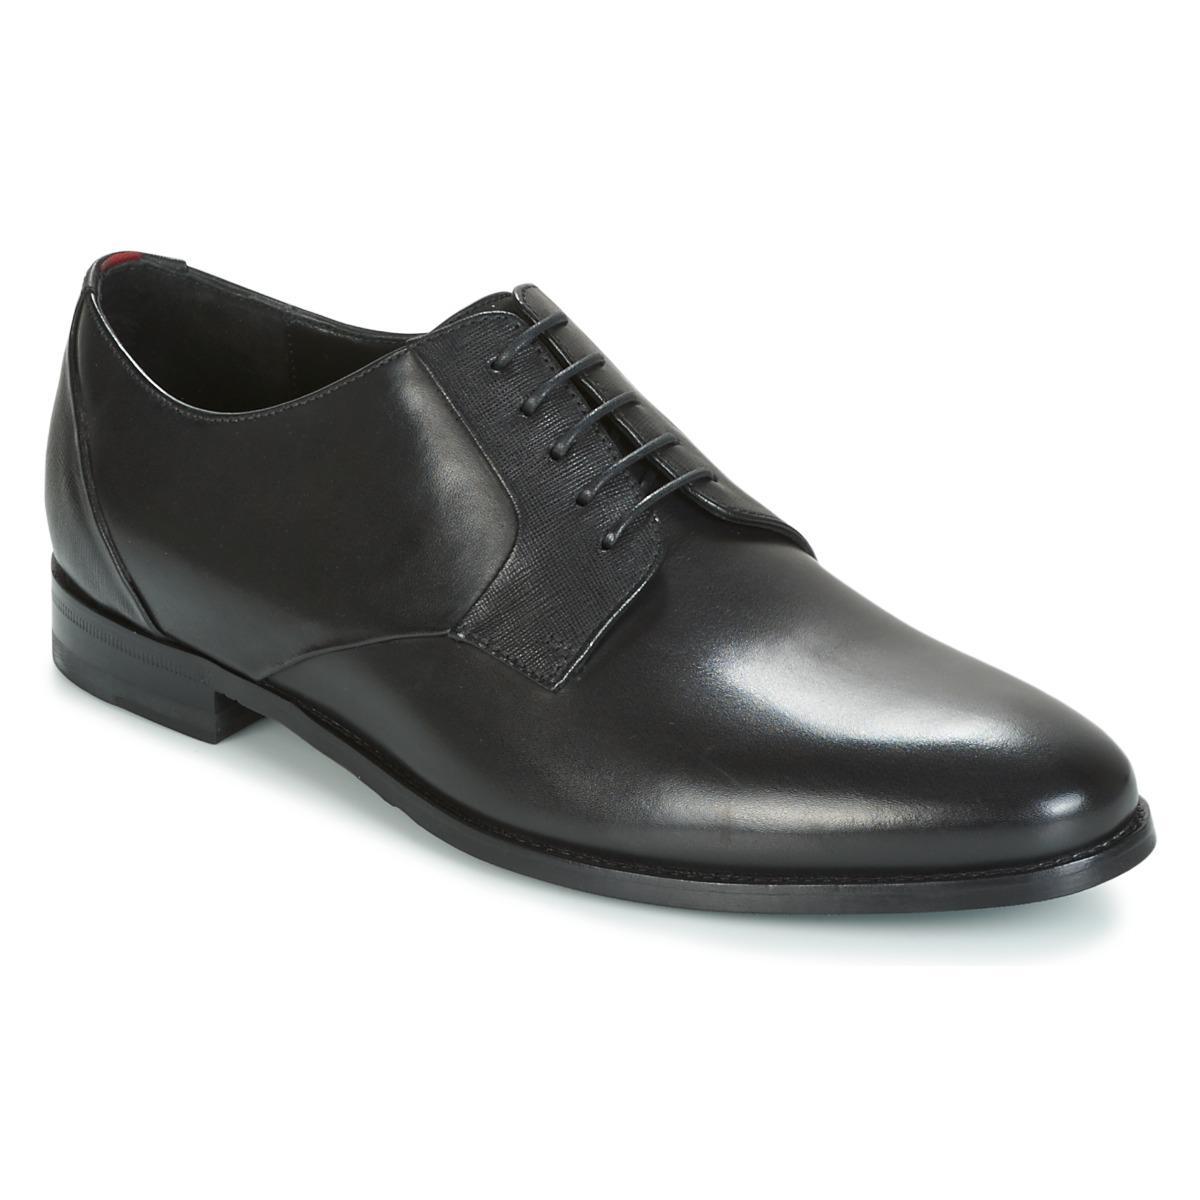 5f35c6eb05c Derb For Lyst Casual In Boss Black Pathos Hugo Shoes Men qEf1Rx71wn